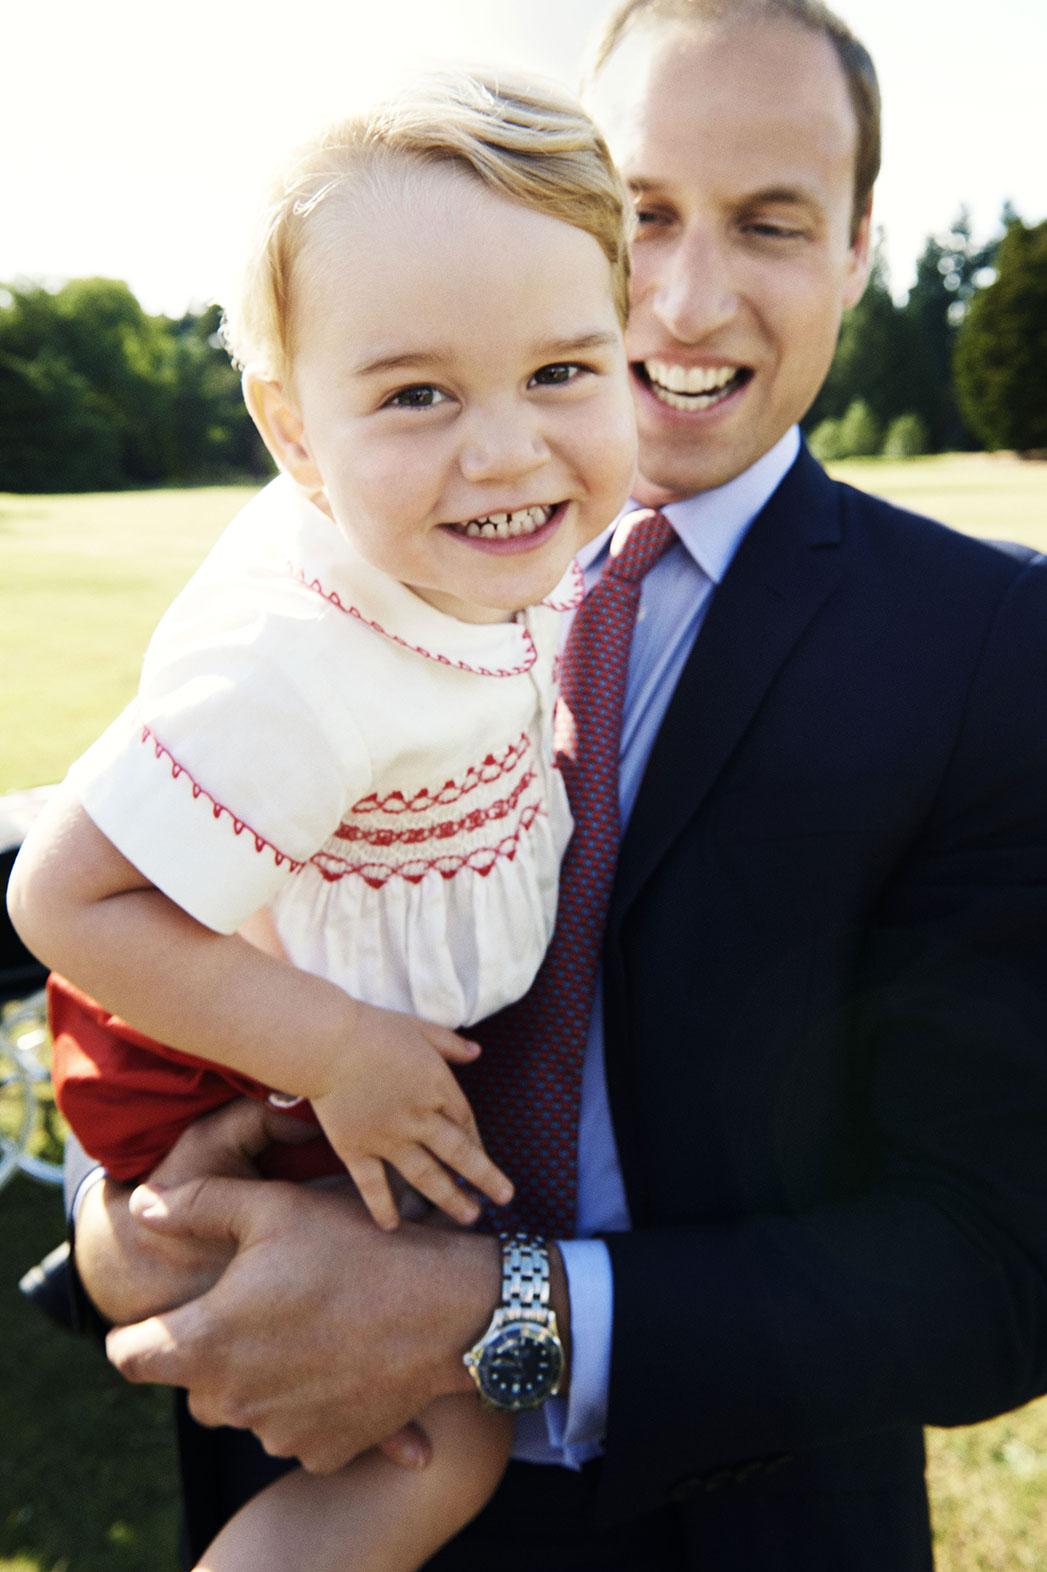 Prince William, Prince George - P 2015